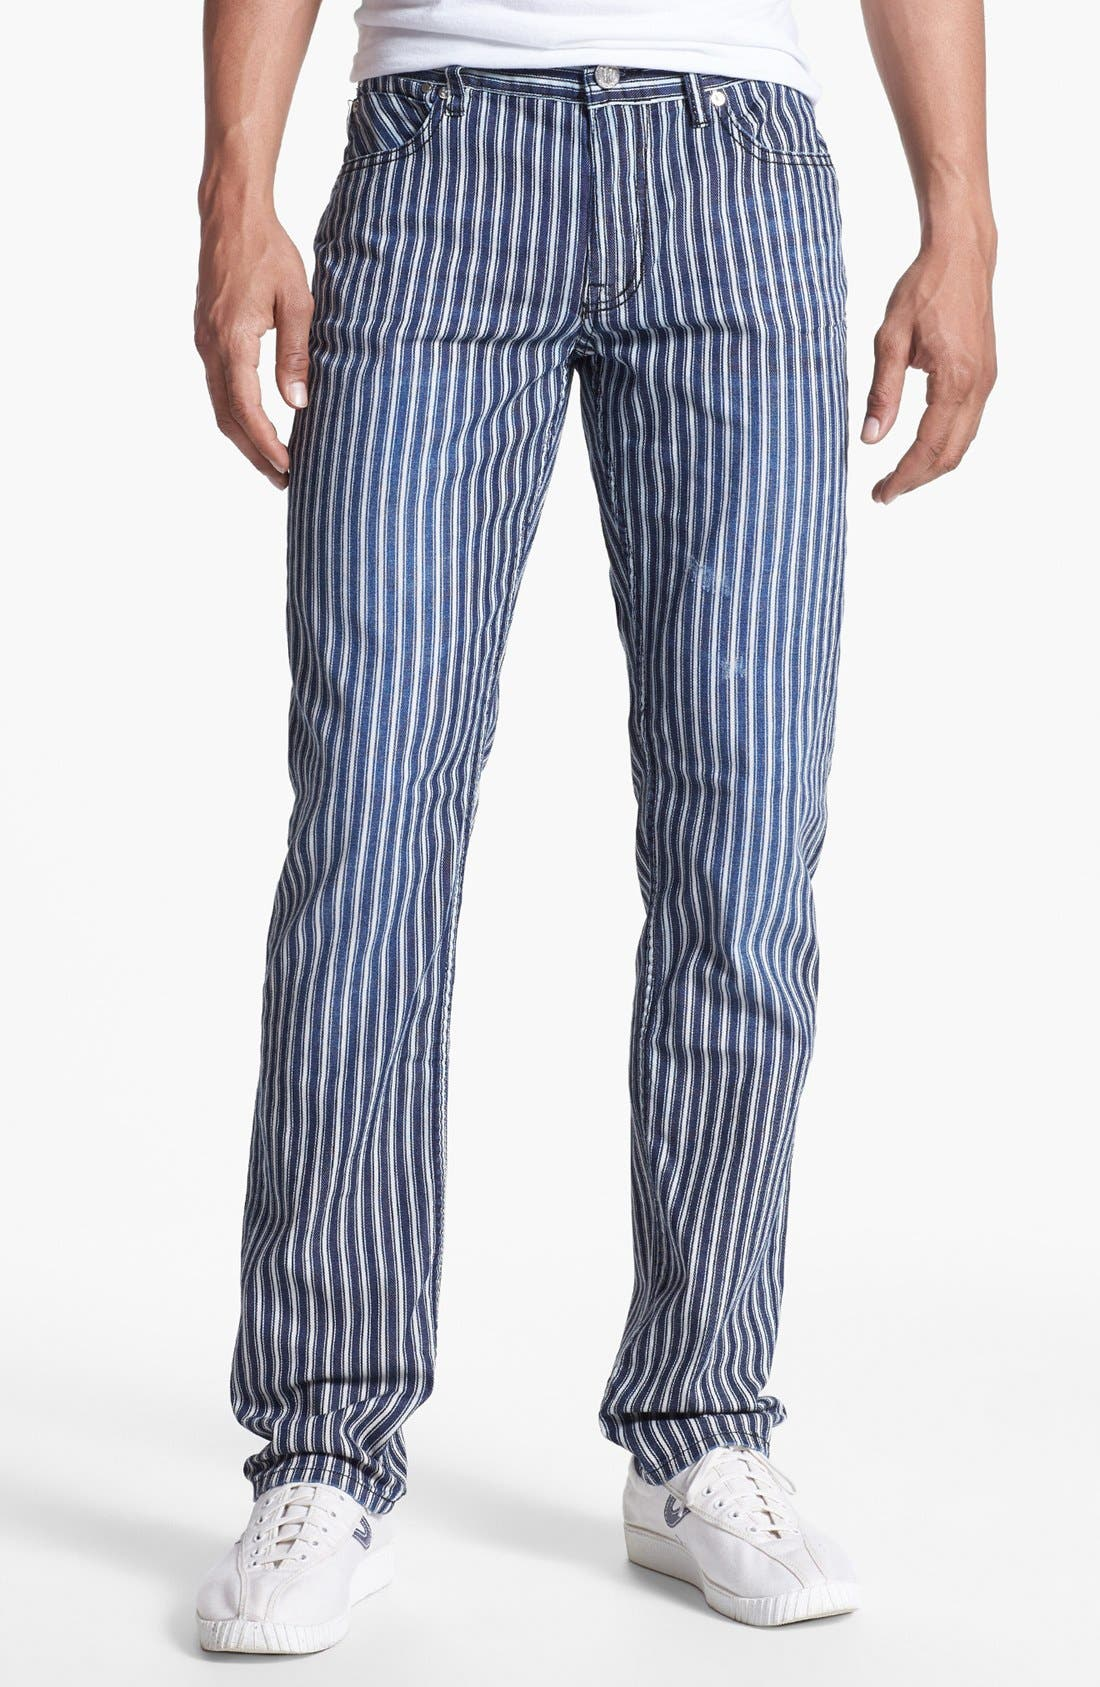 Main Image - Williamsburg Garment Company 'Grand Street' Slim Fit Jeans (Engineer Stripe)